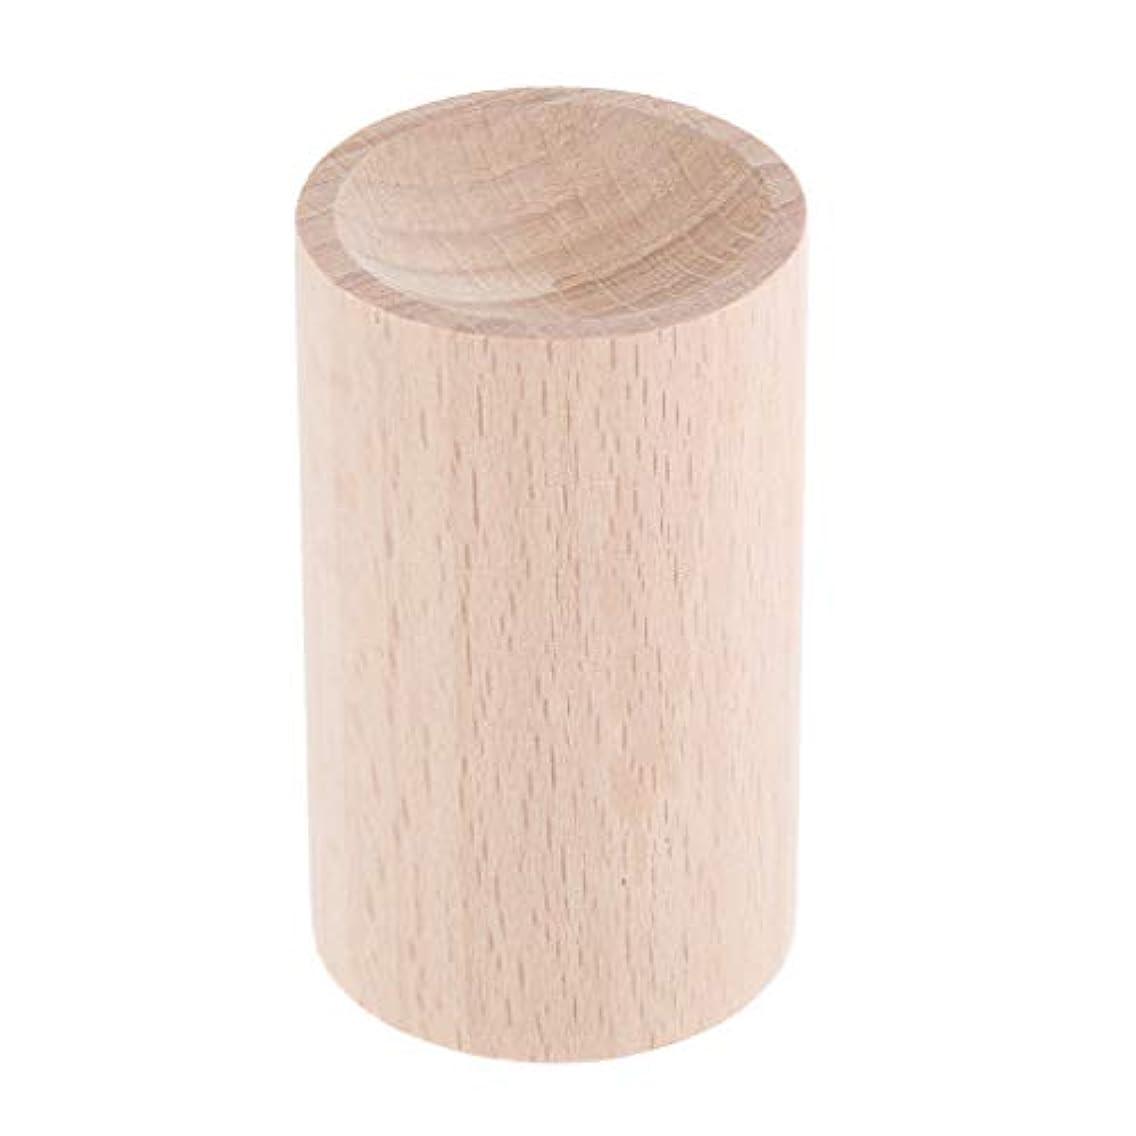 D DOLITY 天然木 ハンドメイド 手作り 空気清浄 エッセンシャルオイル 香水 アロマディフューザー 2種選ぶ - 01, 3.2cm